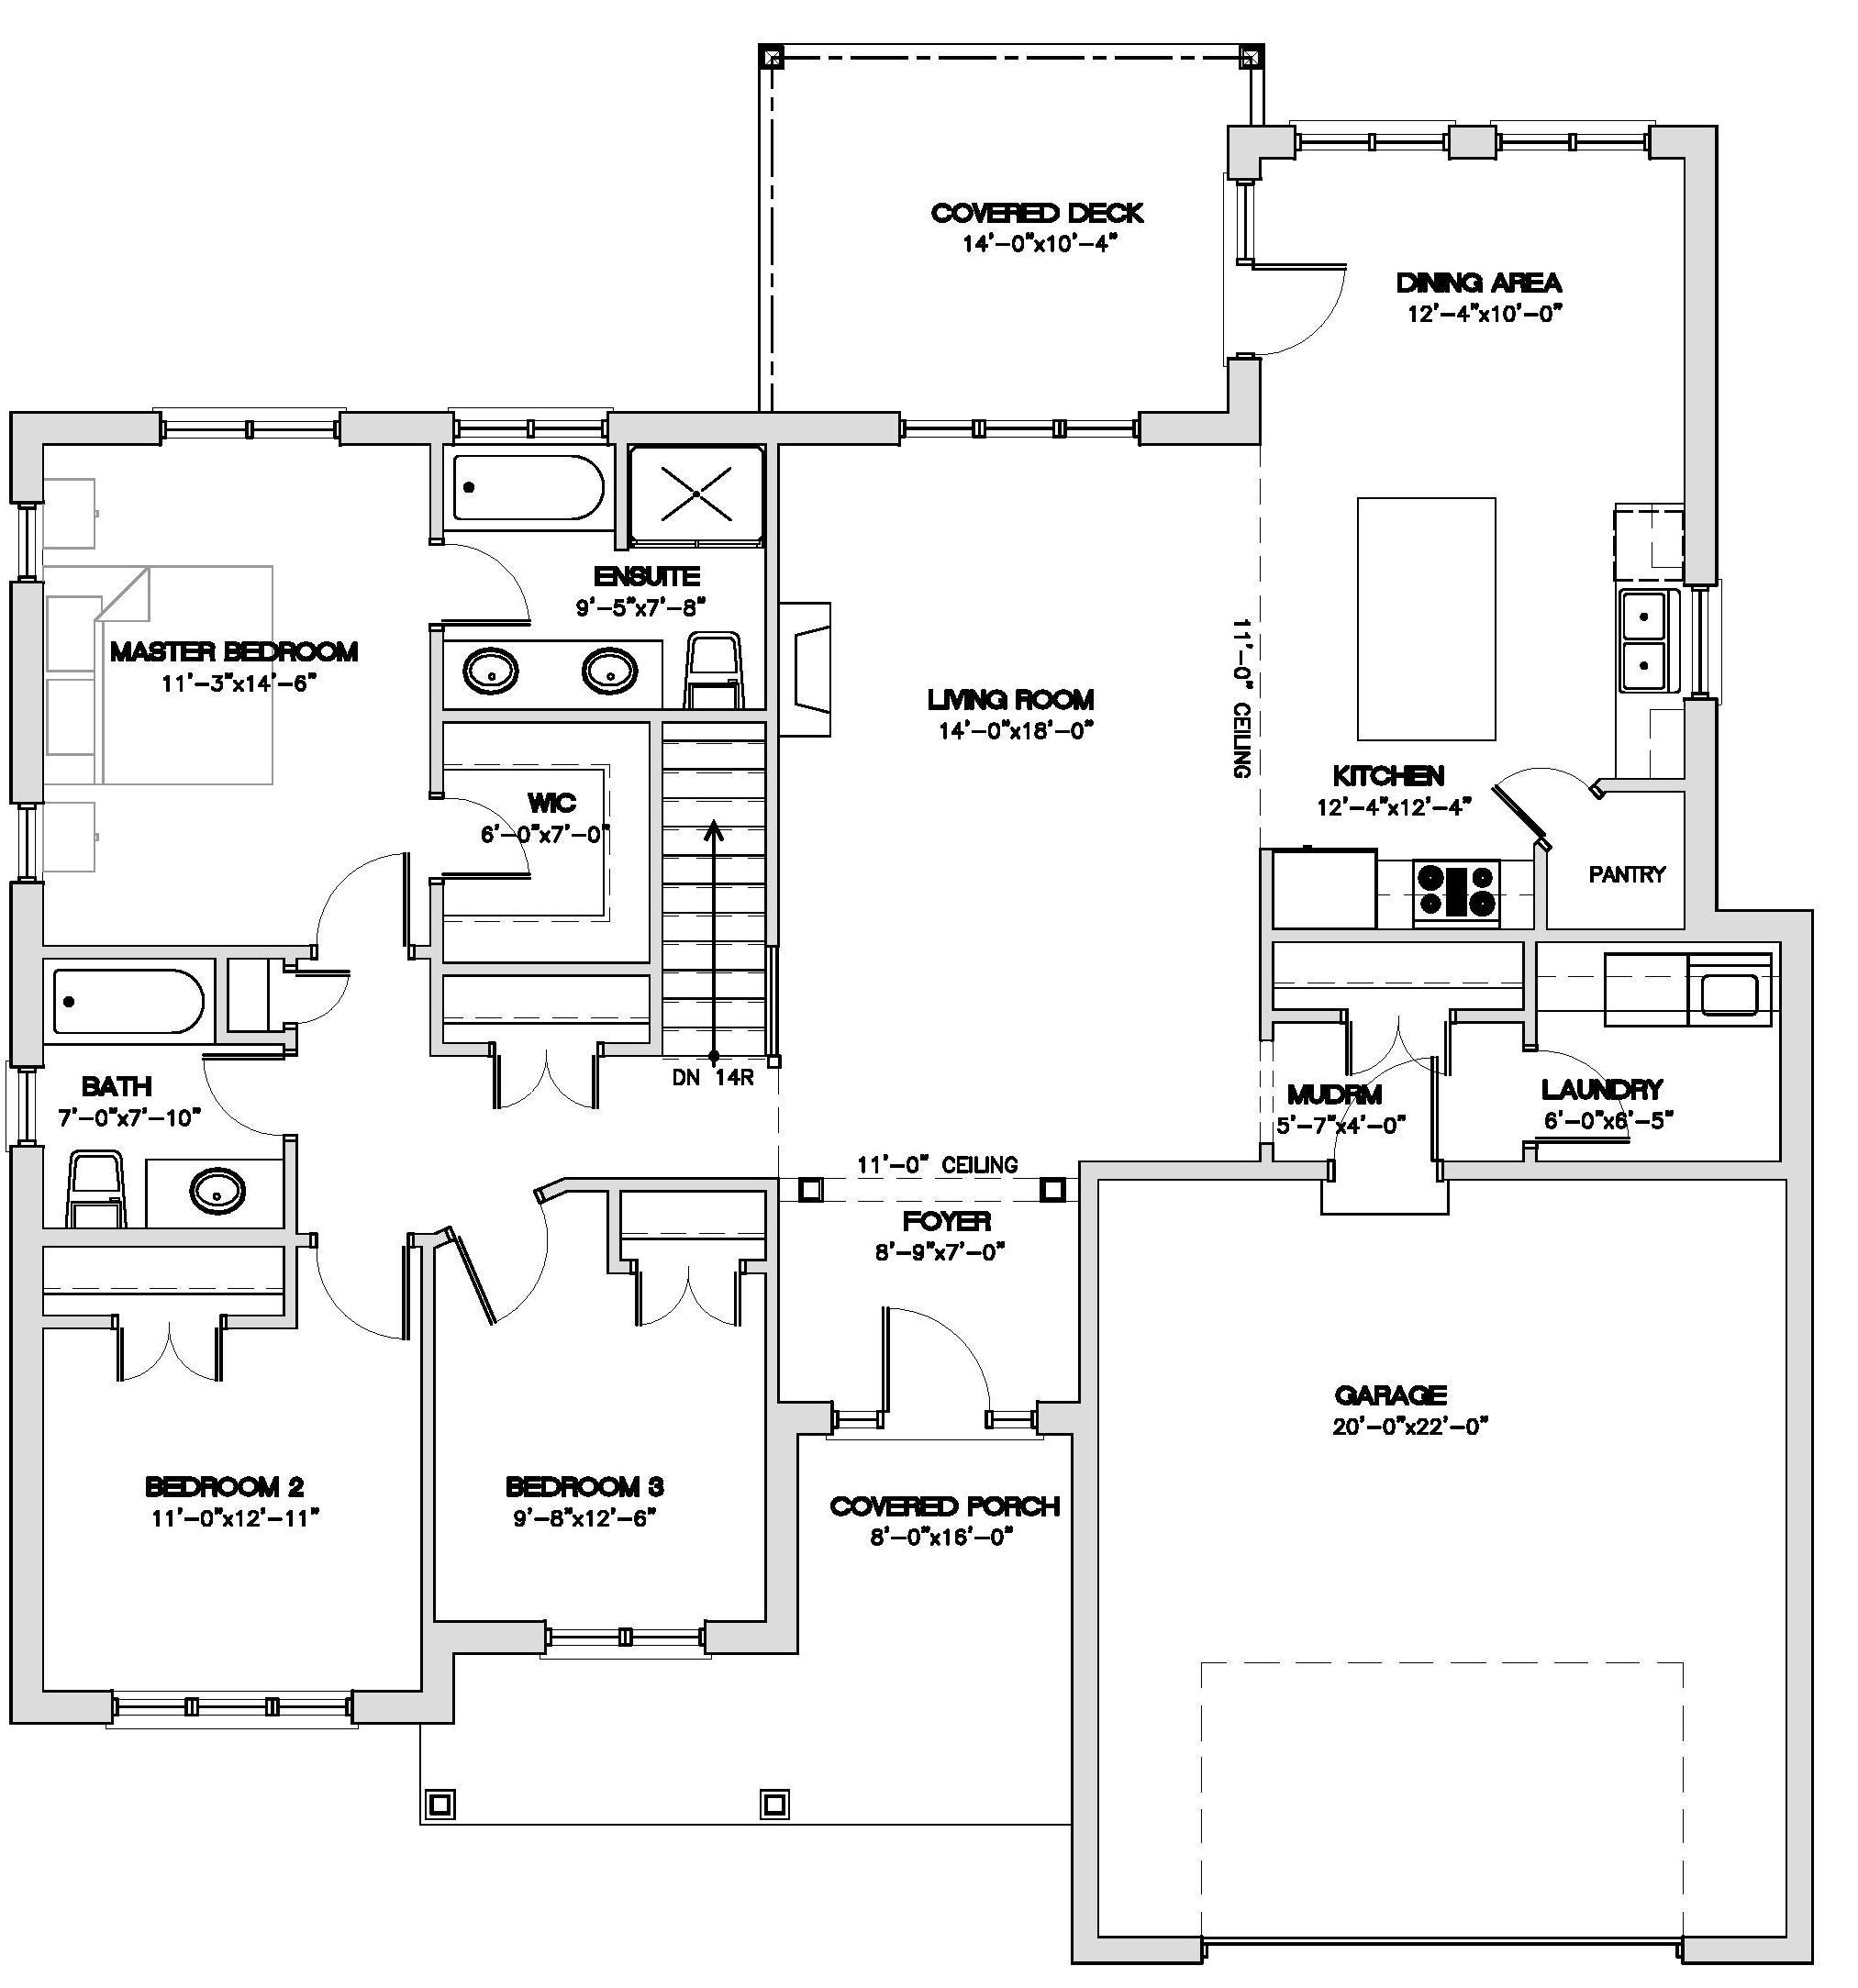 Presentation Floor Plan cropped 04-18-16.jpg